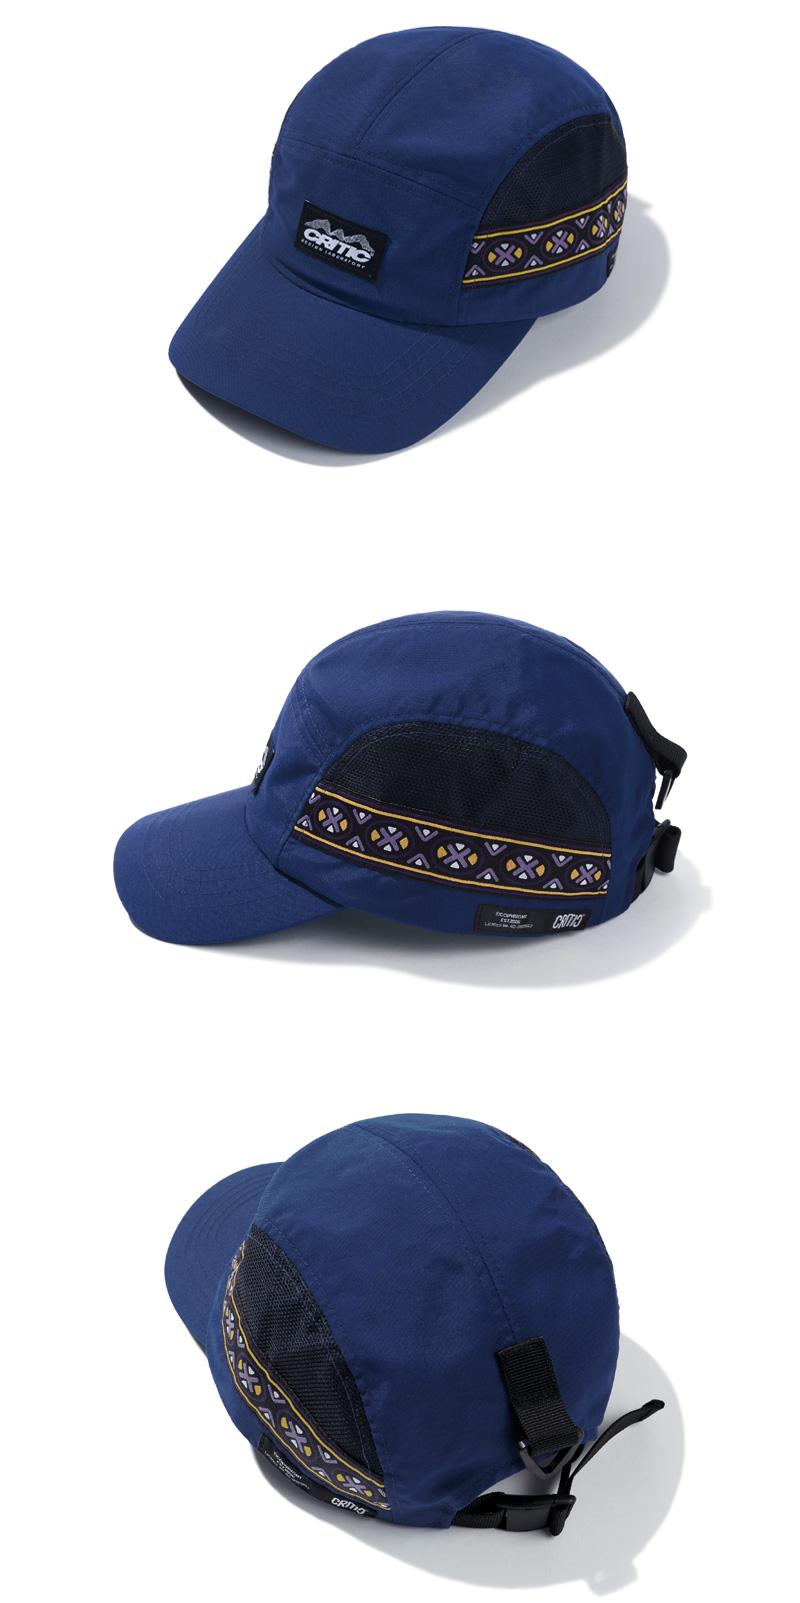 ETHNIC MESH CAMP CAP(DEEP BLUE)_CTTZPHW03UB6